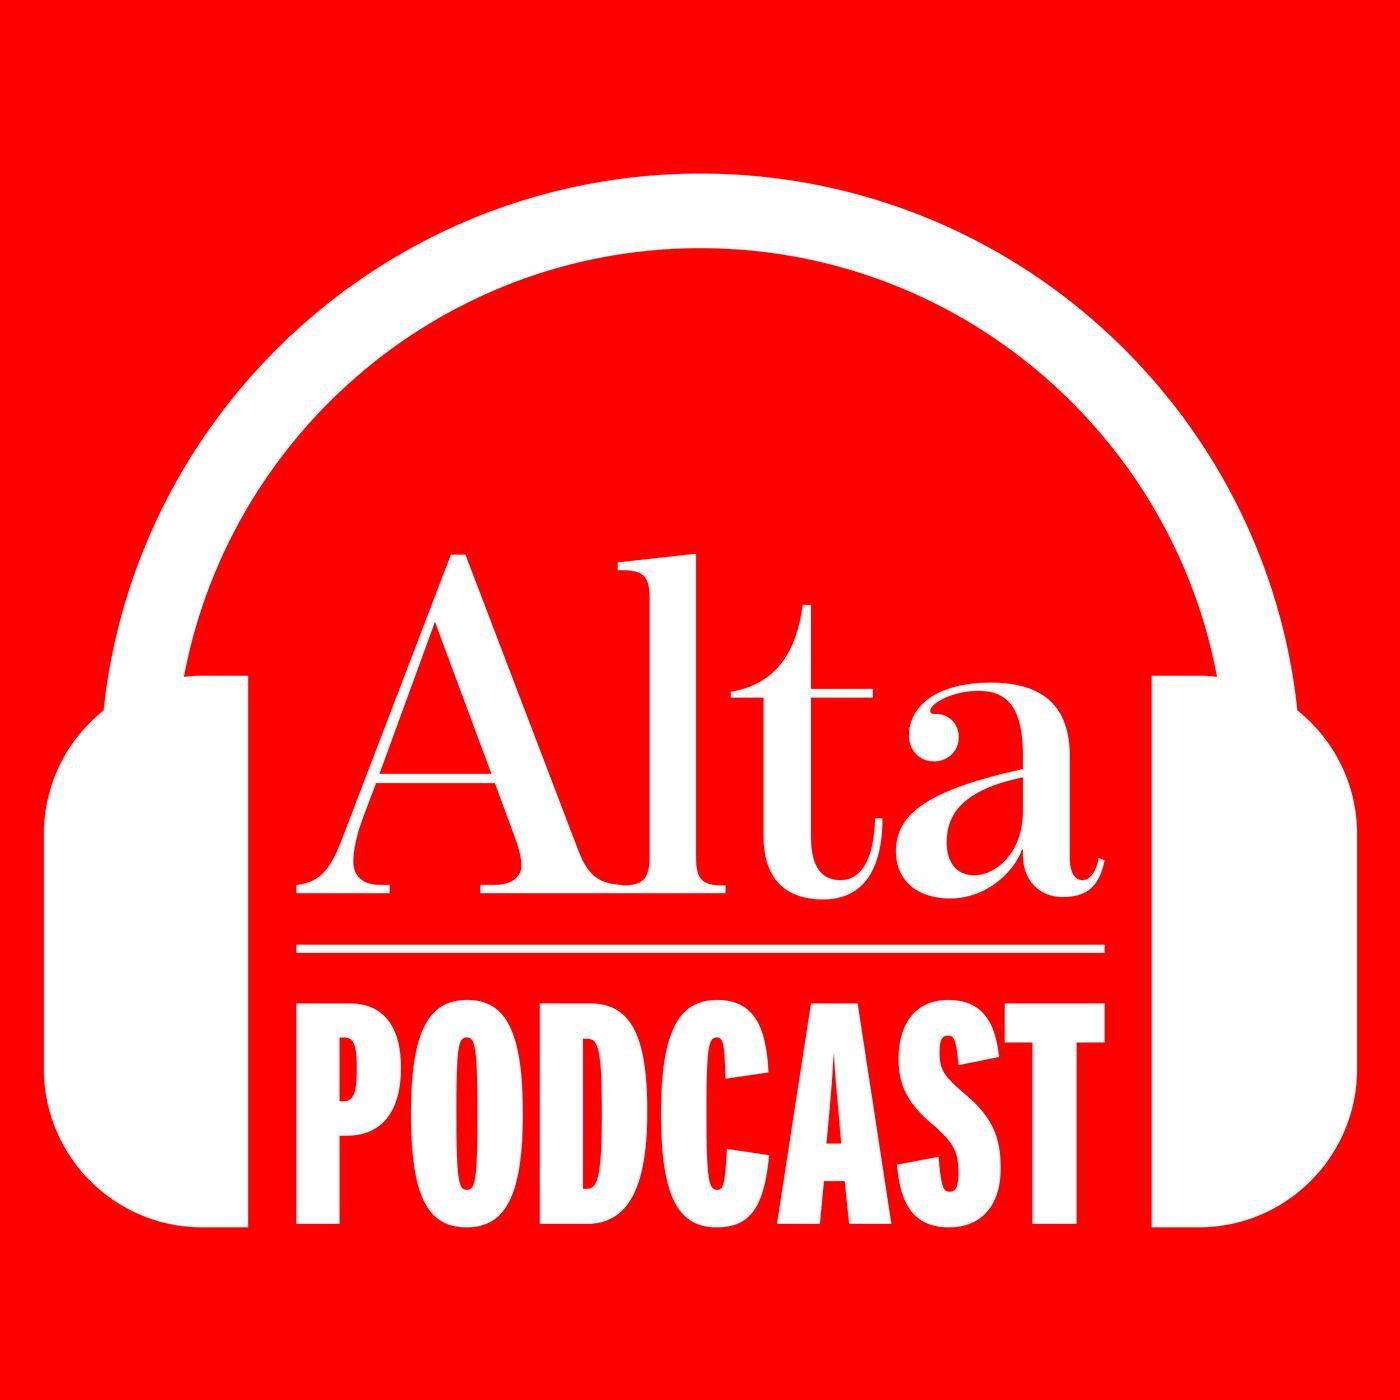 Alta Podcast show art